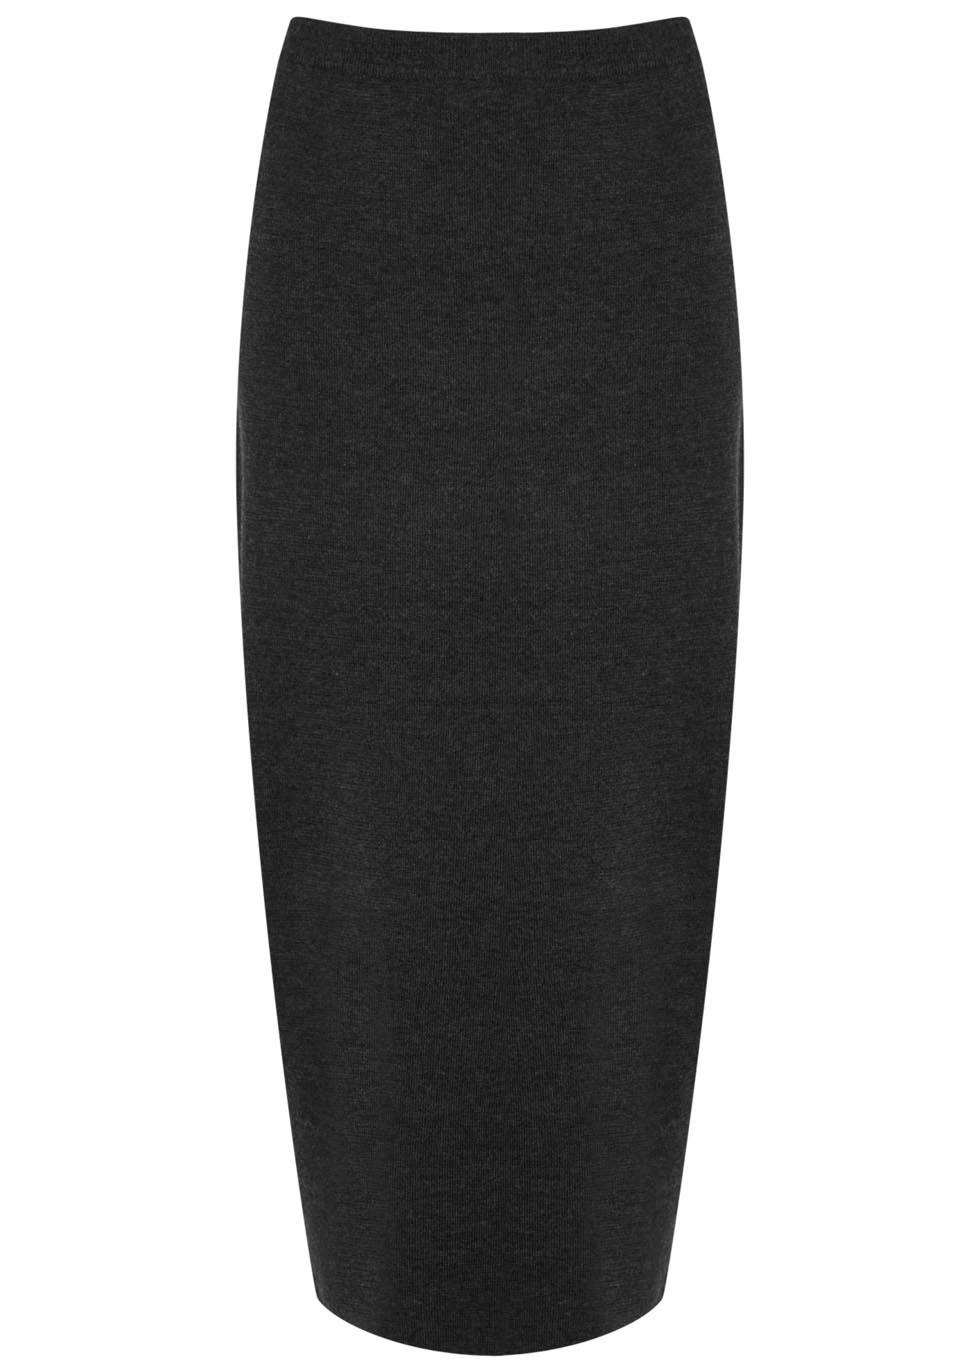 eileen fisher charcoal merino wool pencil skirt in black